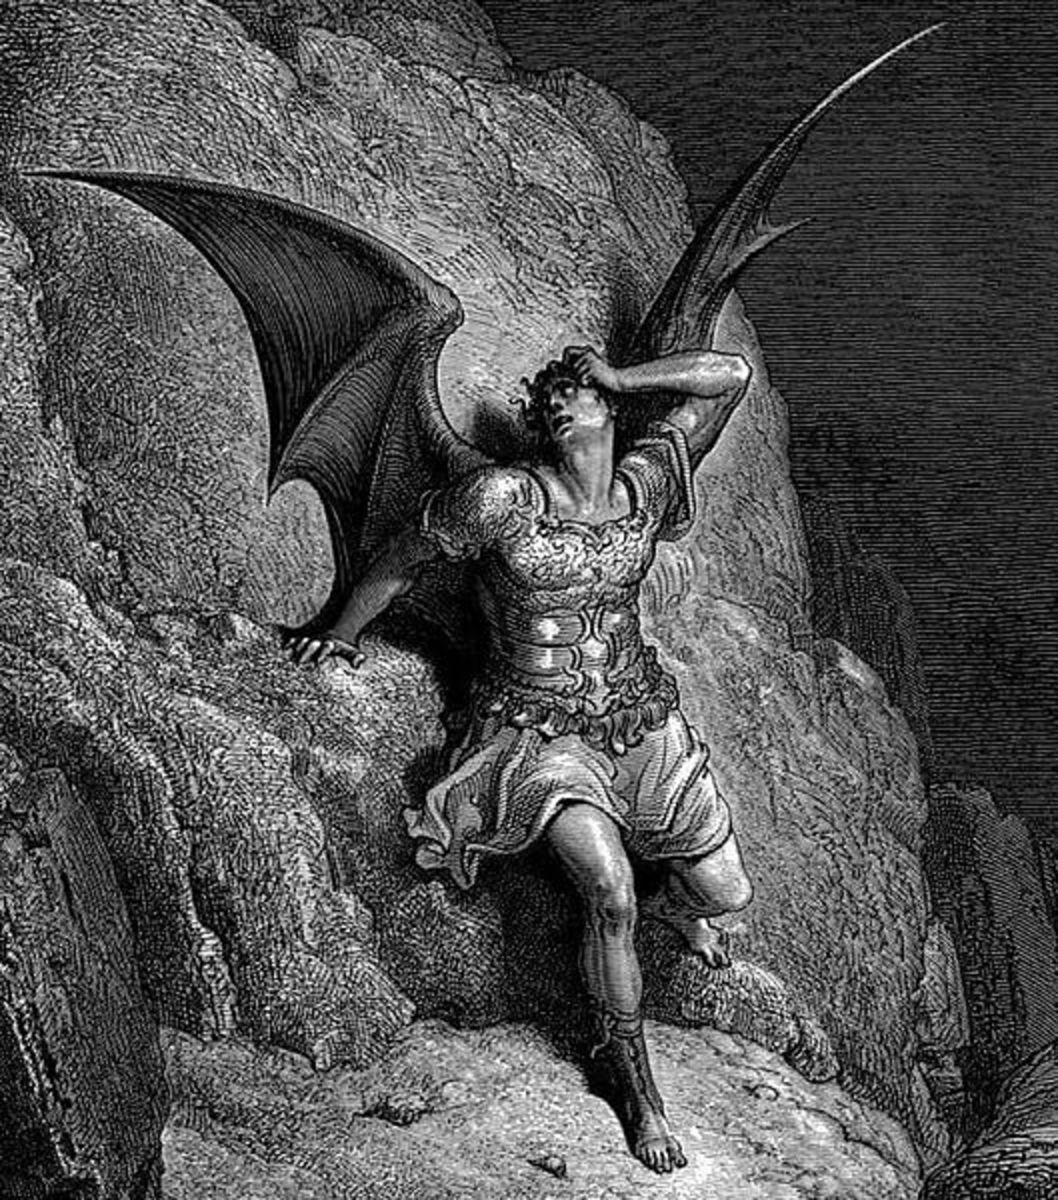 Satan: The Fallen One